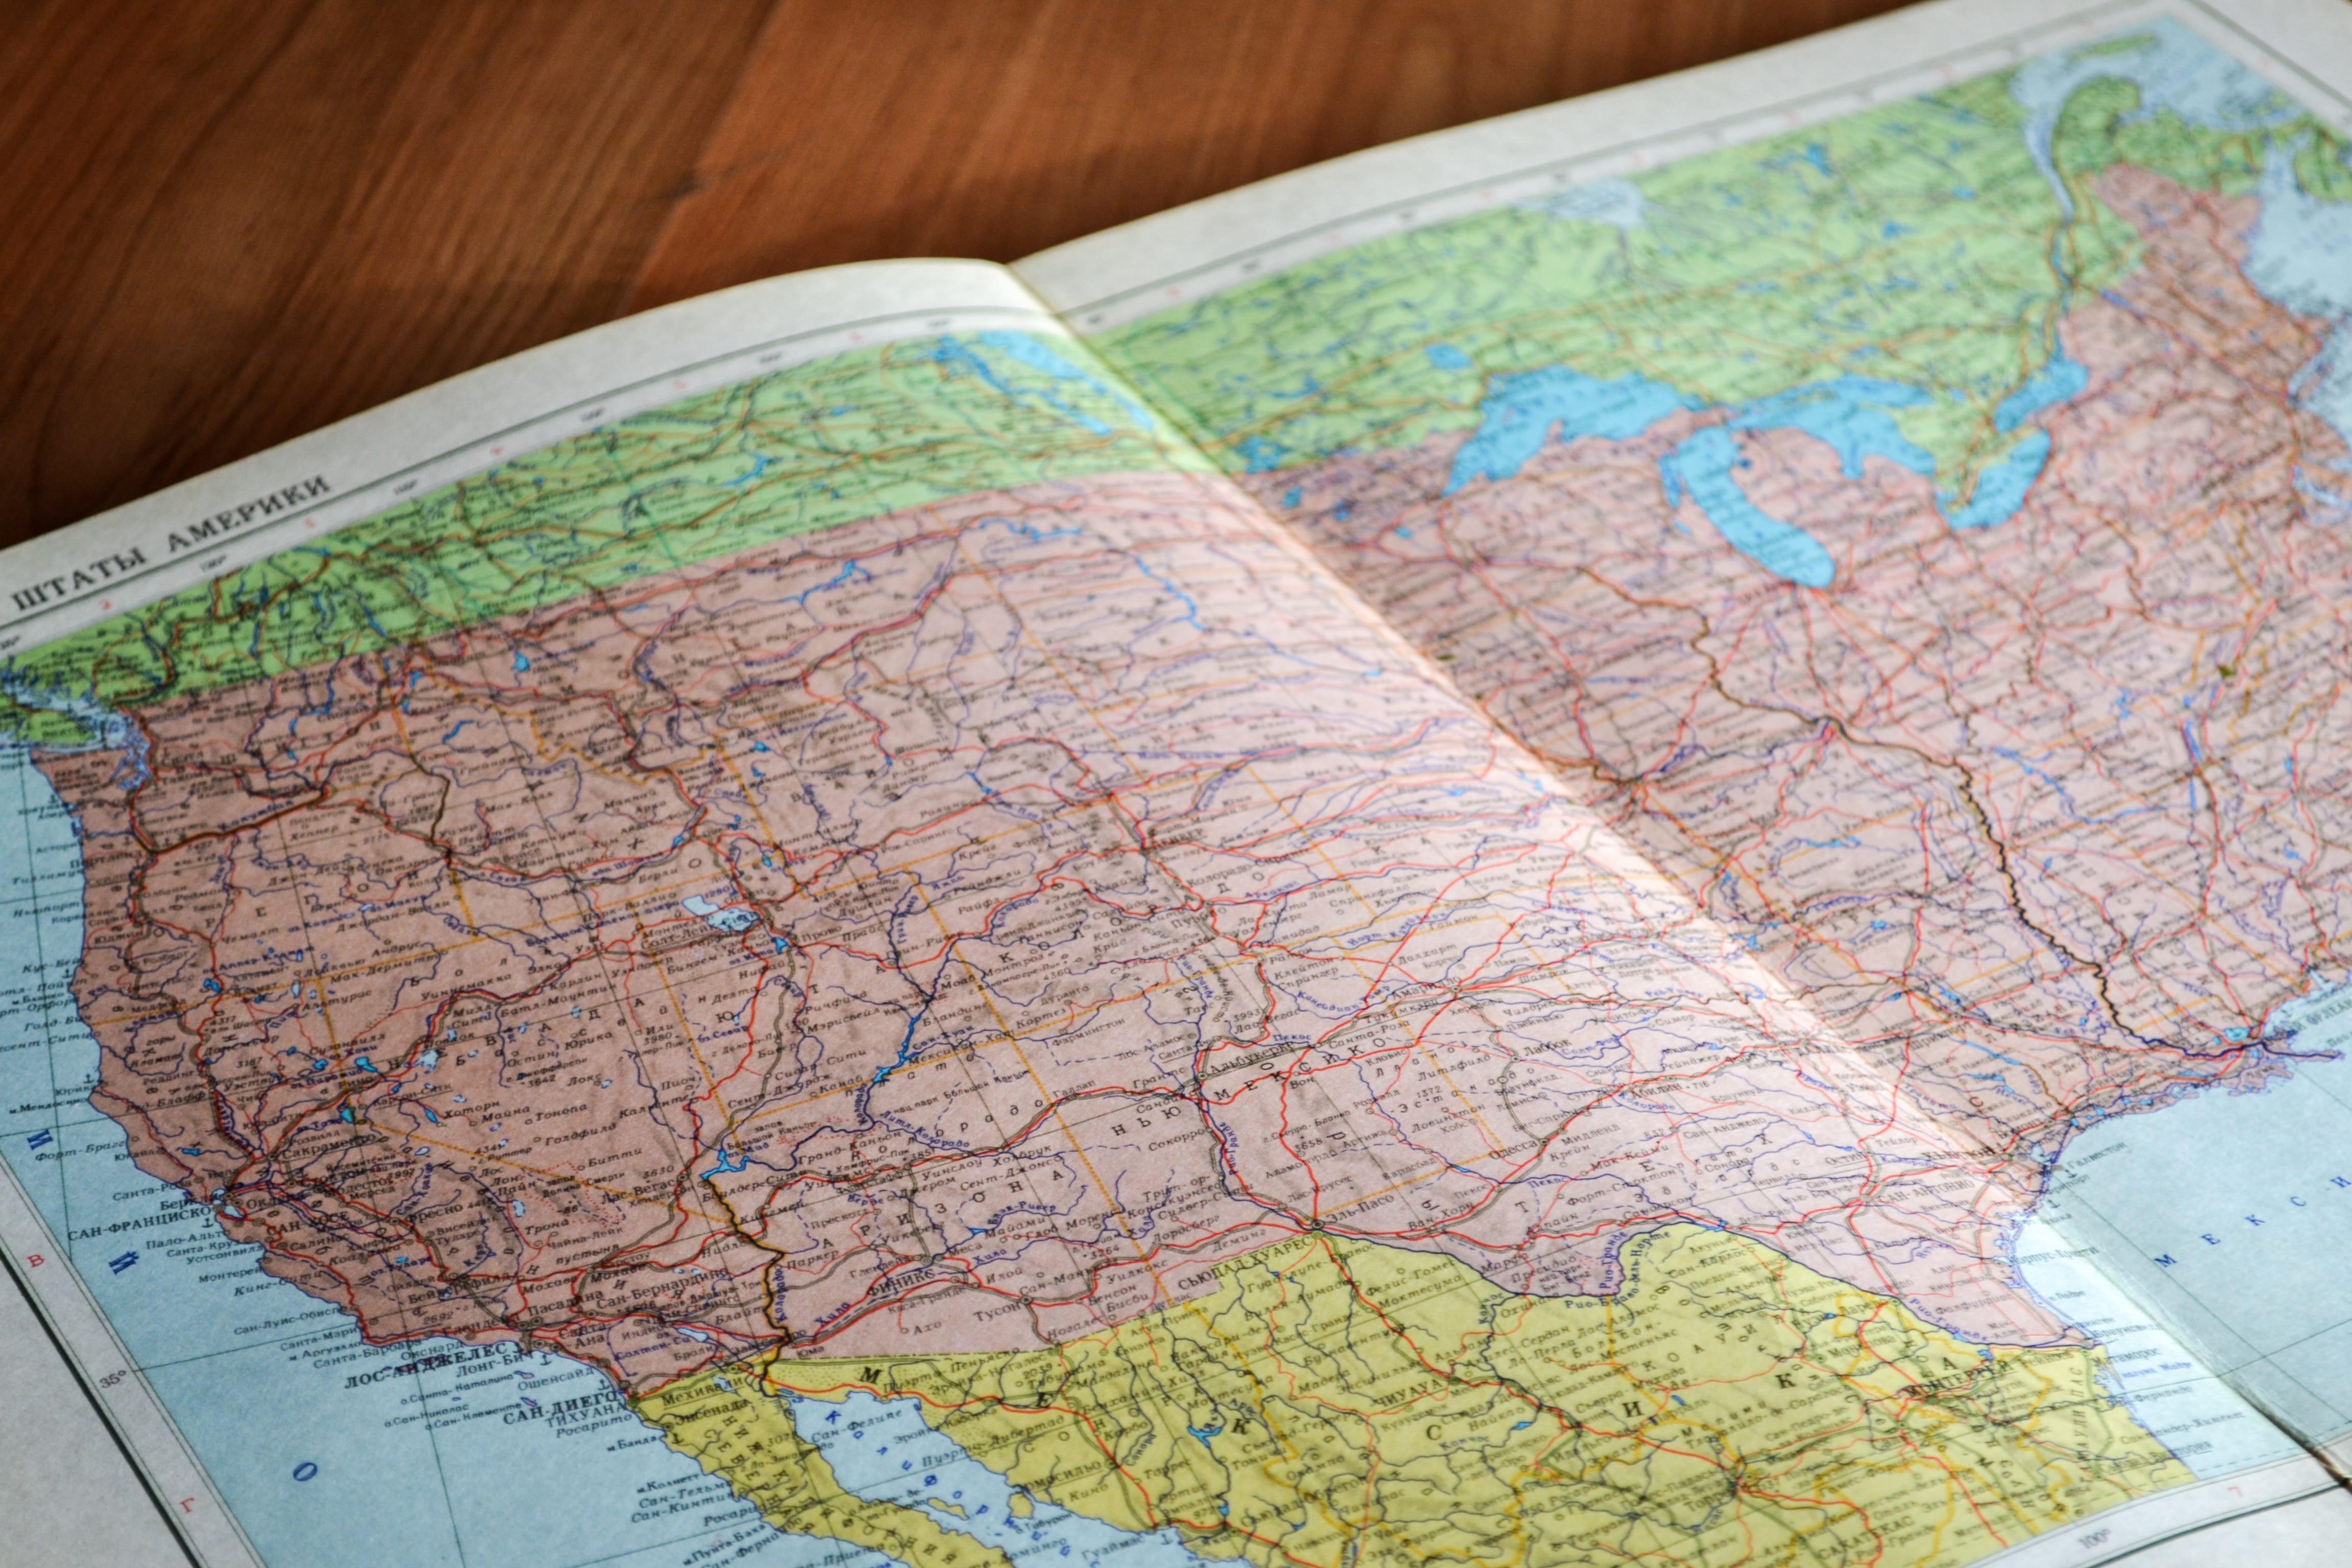 Atlas of the United States; image by John-Mark Smith, via Unsplash.com.